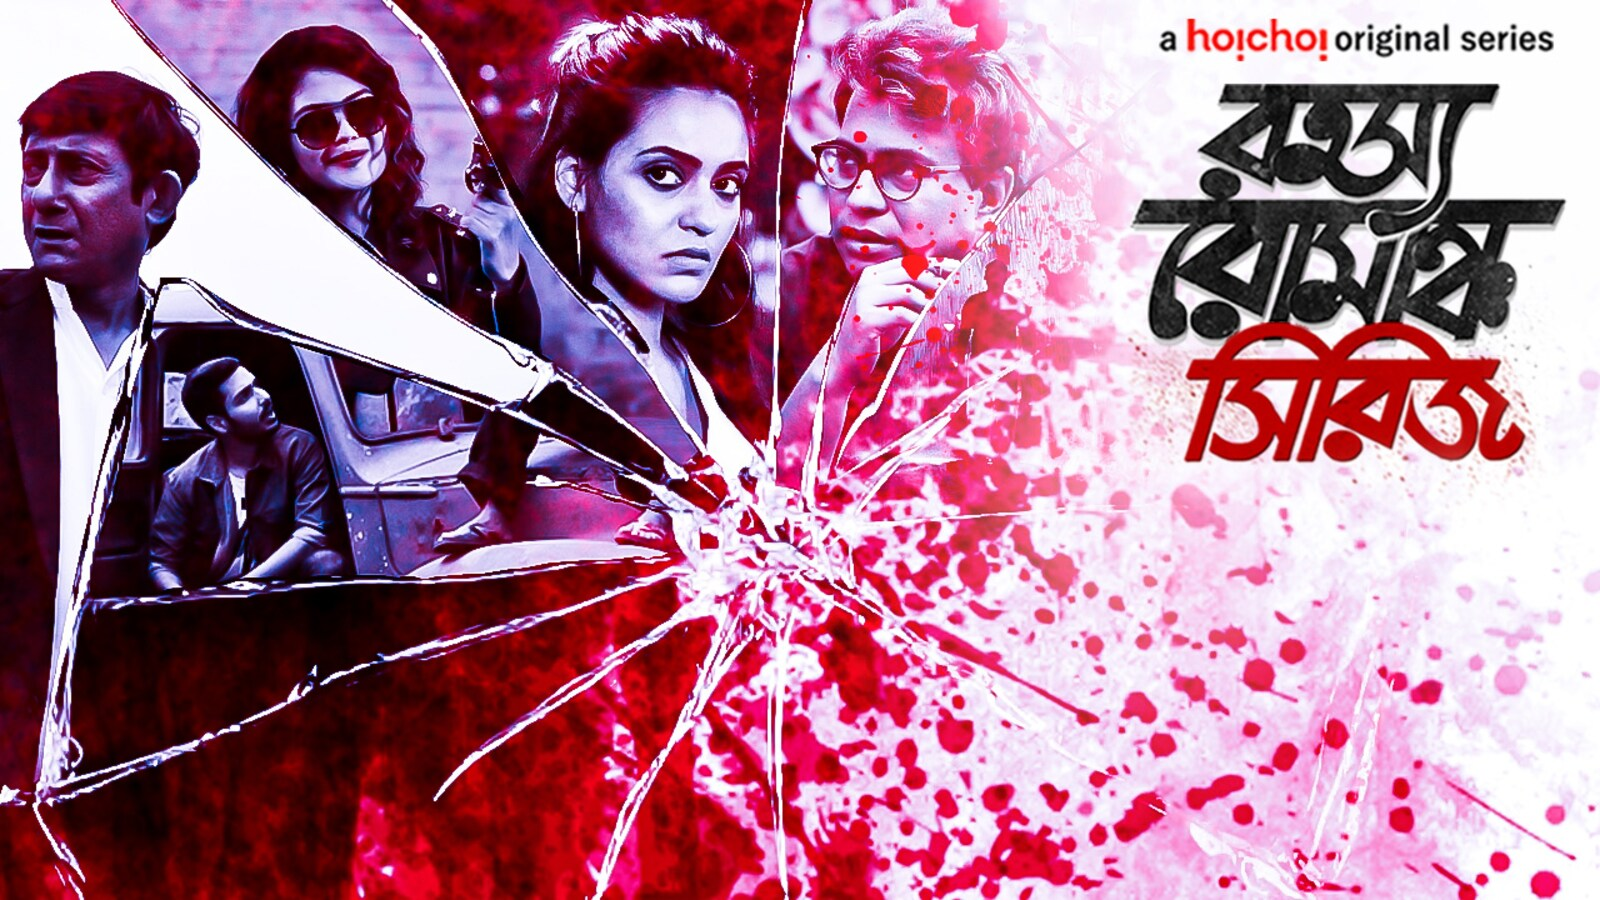 Rahasya Romancha Series   Hoichoi - Movies   Originals